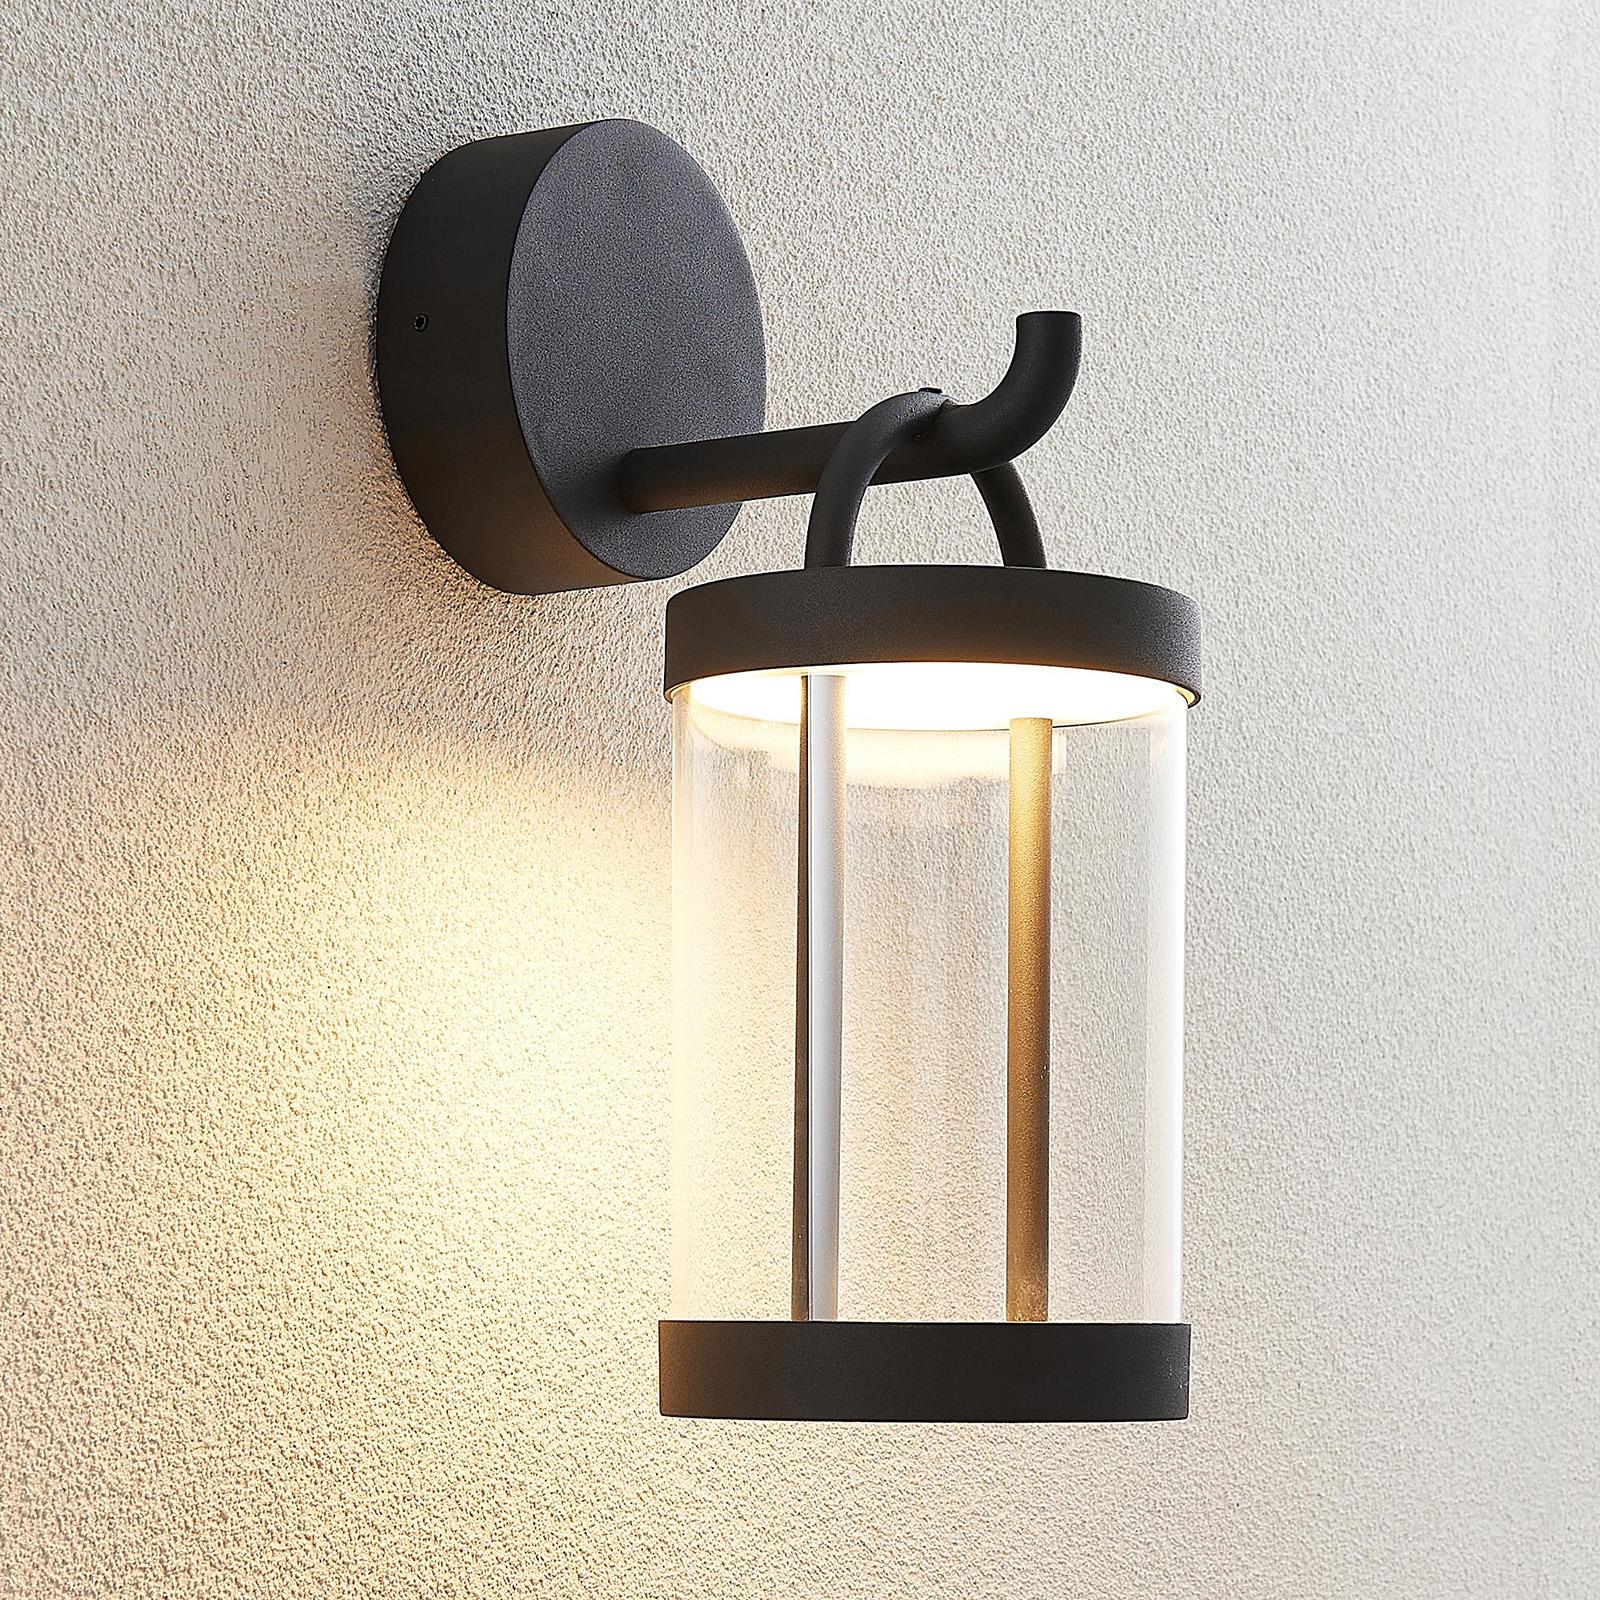 Lucande Caius kinkiet zewnętrzny LED